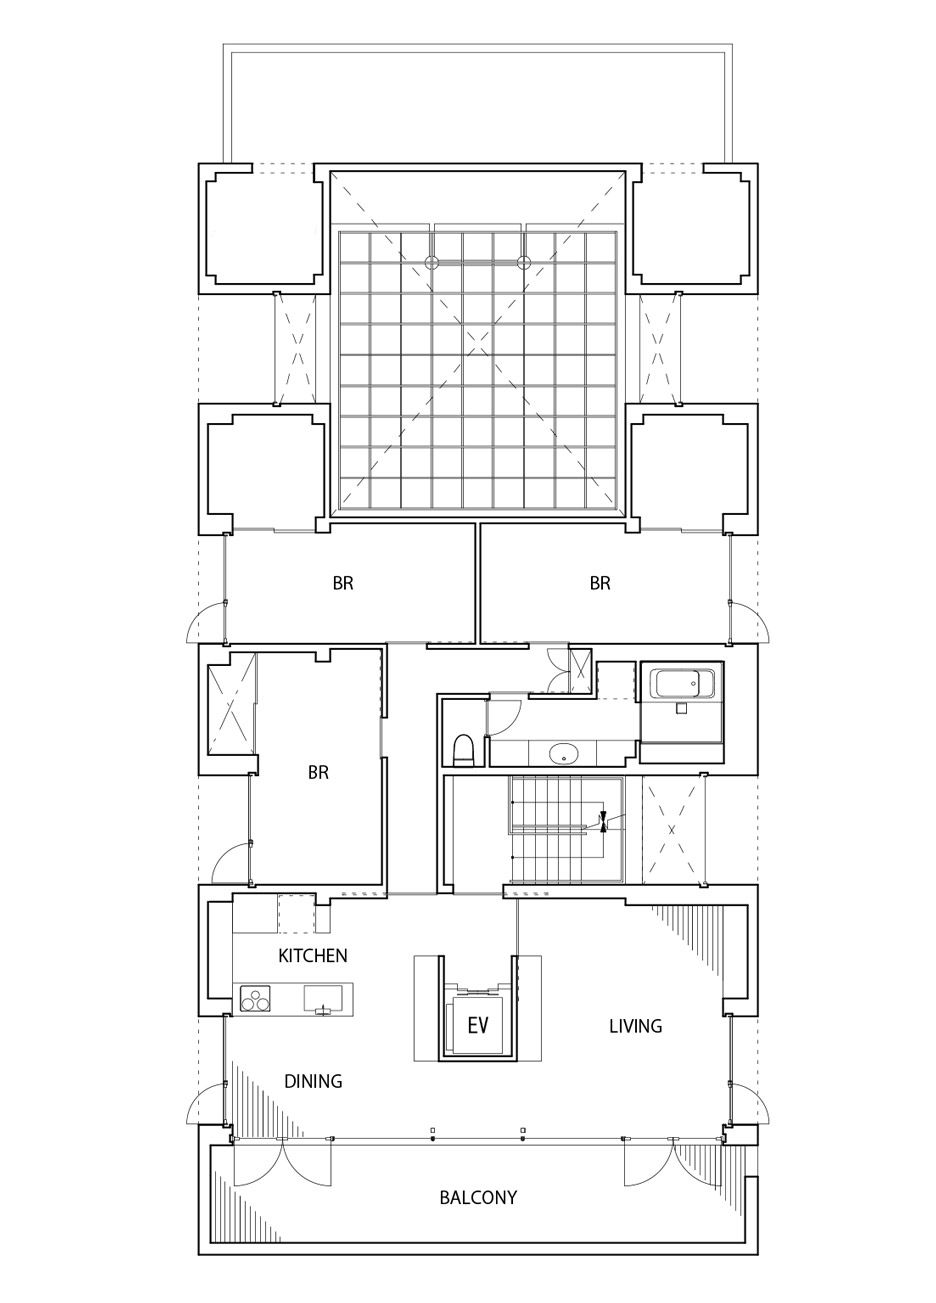 Toru Kashihara Architects Design Stepped Concrete Temple In Tokyo Architect Design Architecture Plan Architect